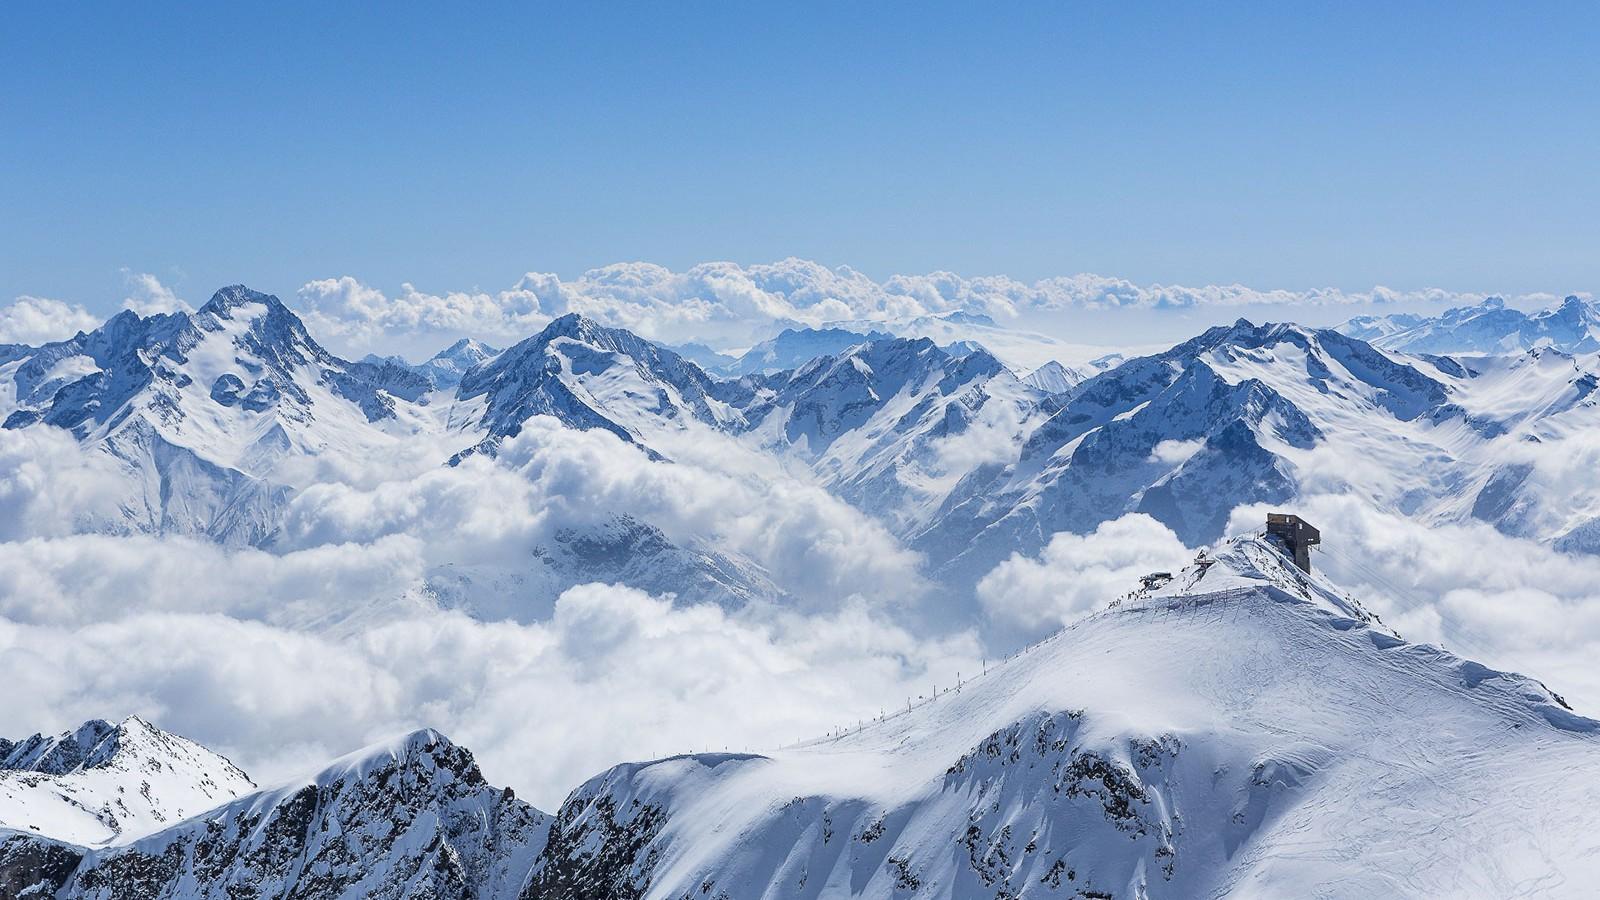 Alpe d'Huez scenery